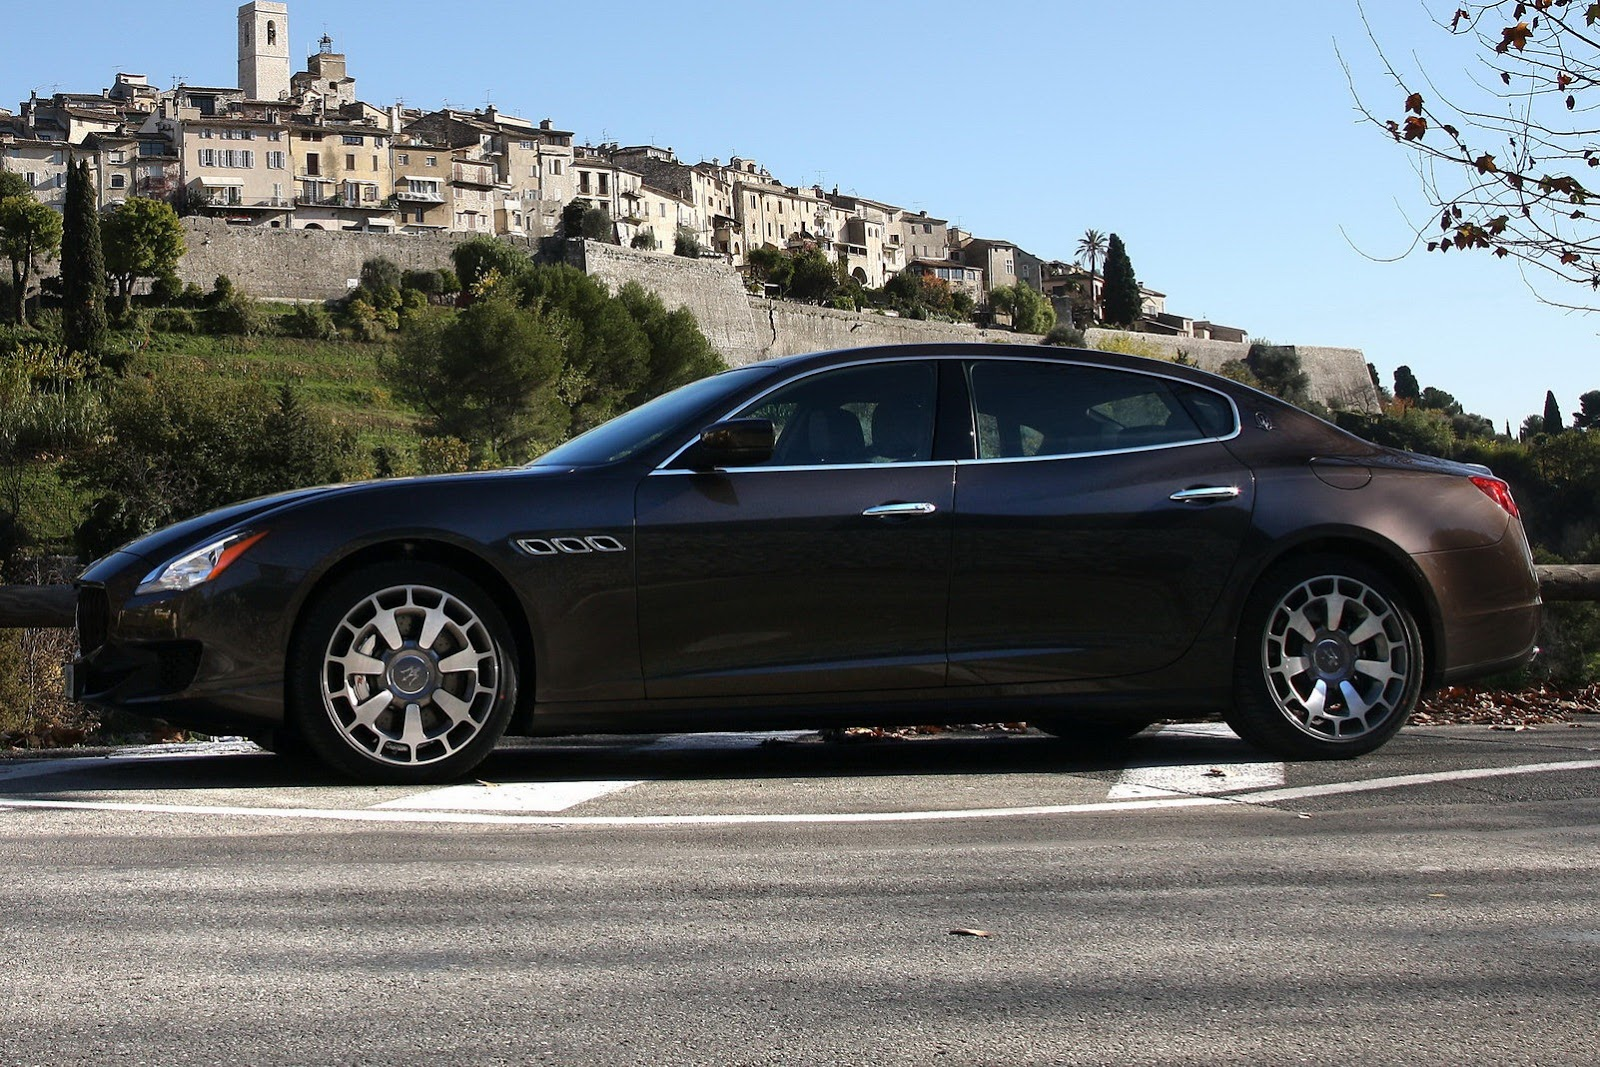 Maserati Quattroporte 2013 new-2013-maserati-quattroporte